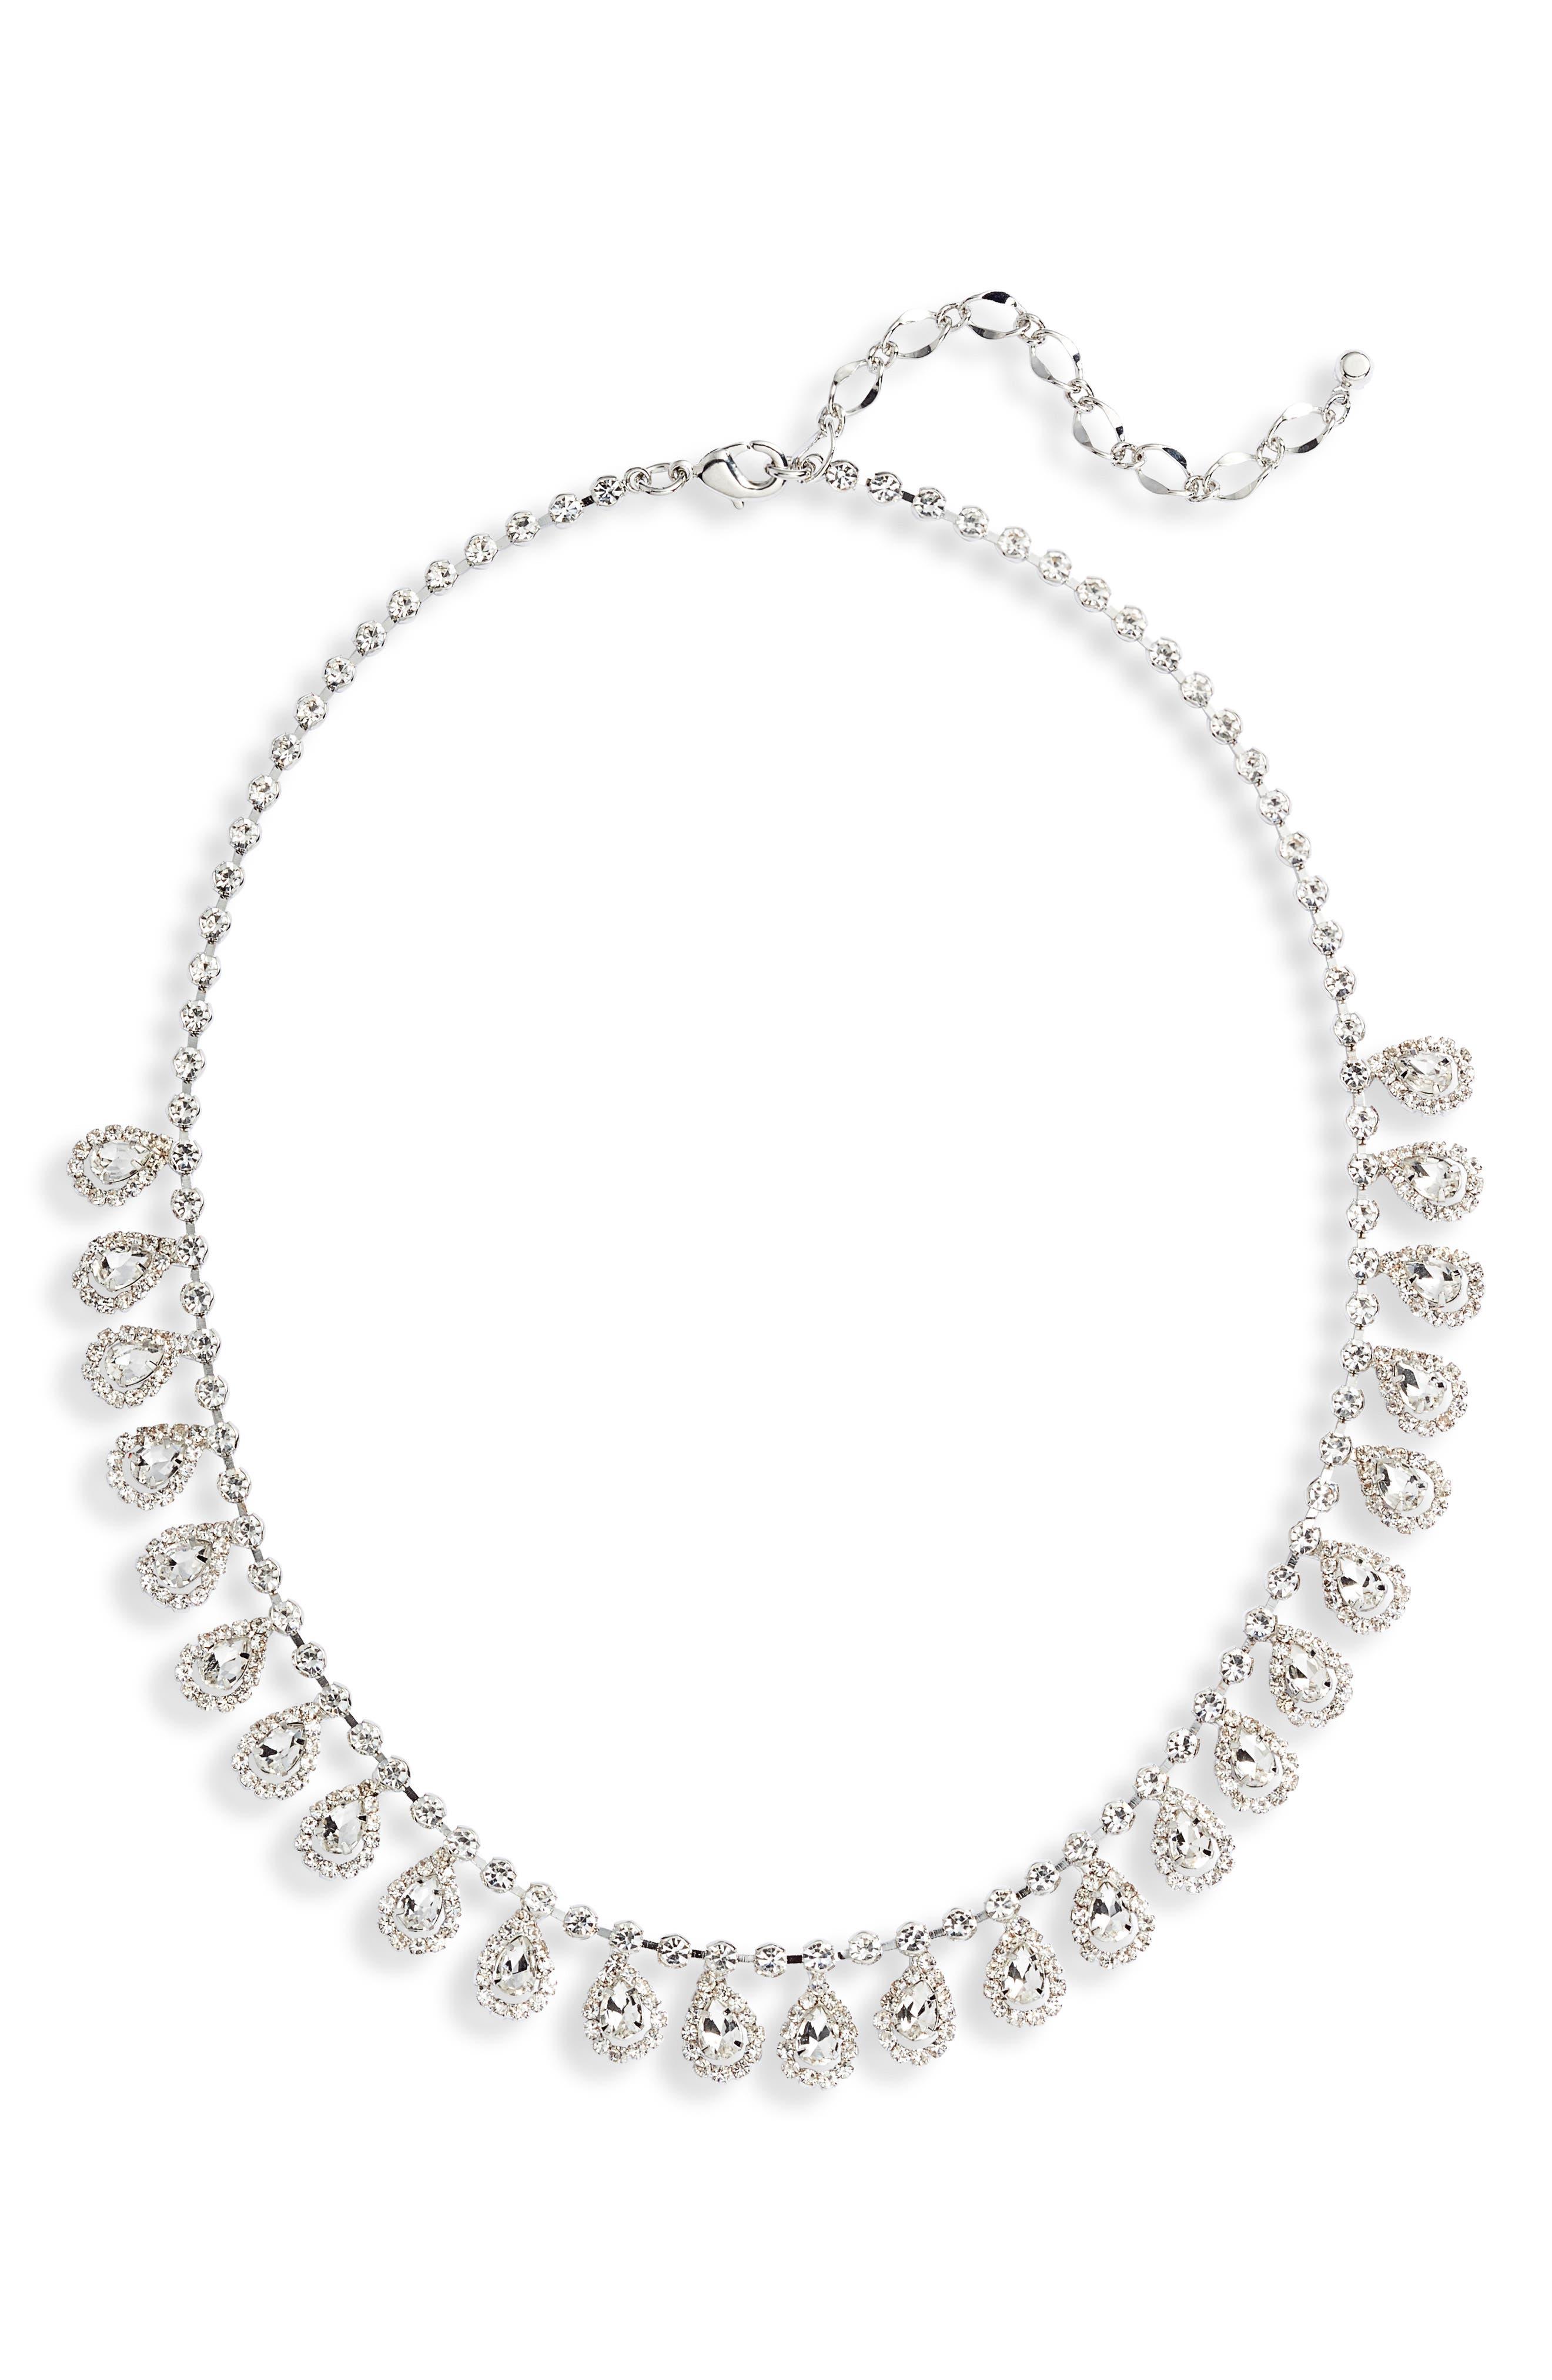 Crystal Teardrop Frontal Necklace